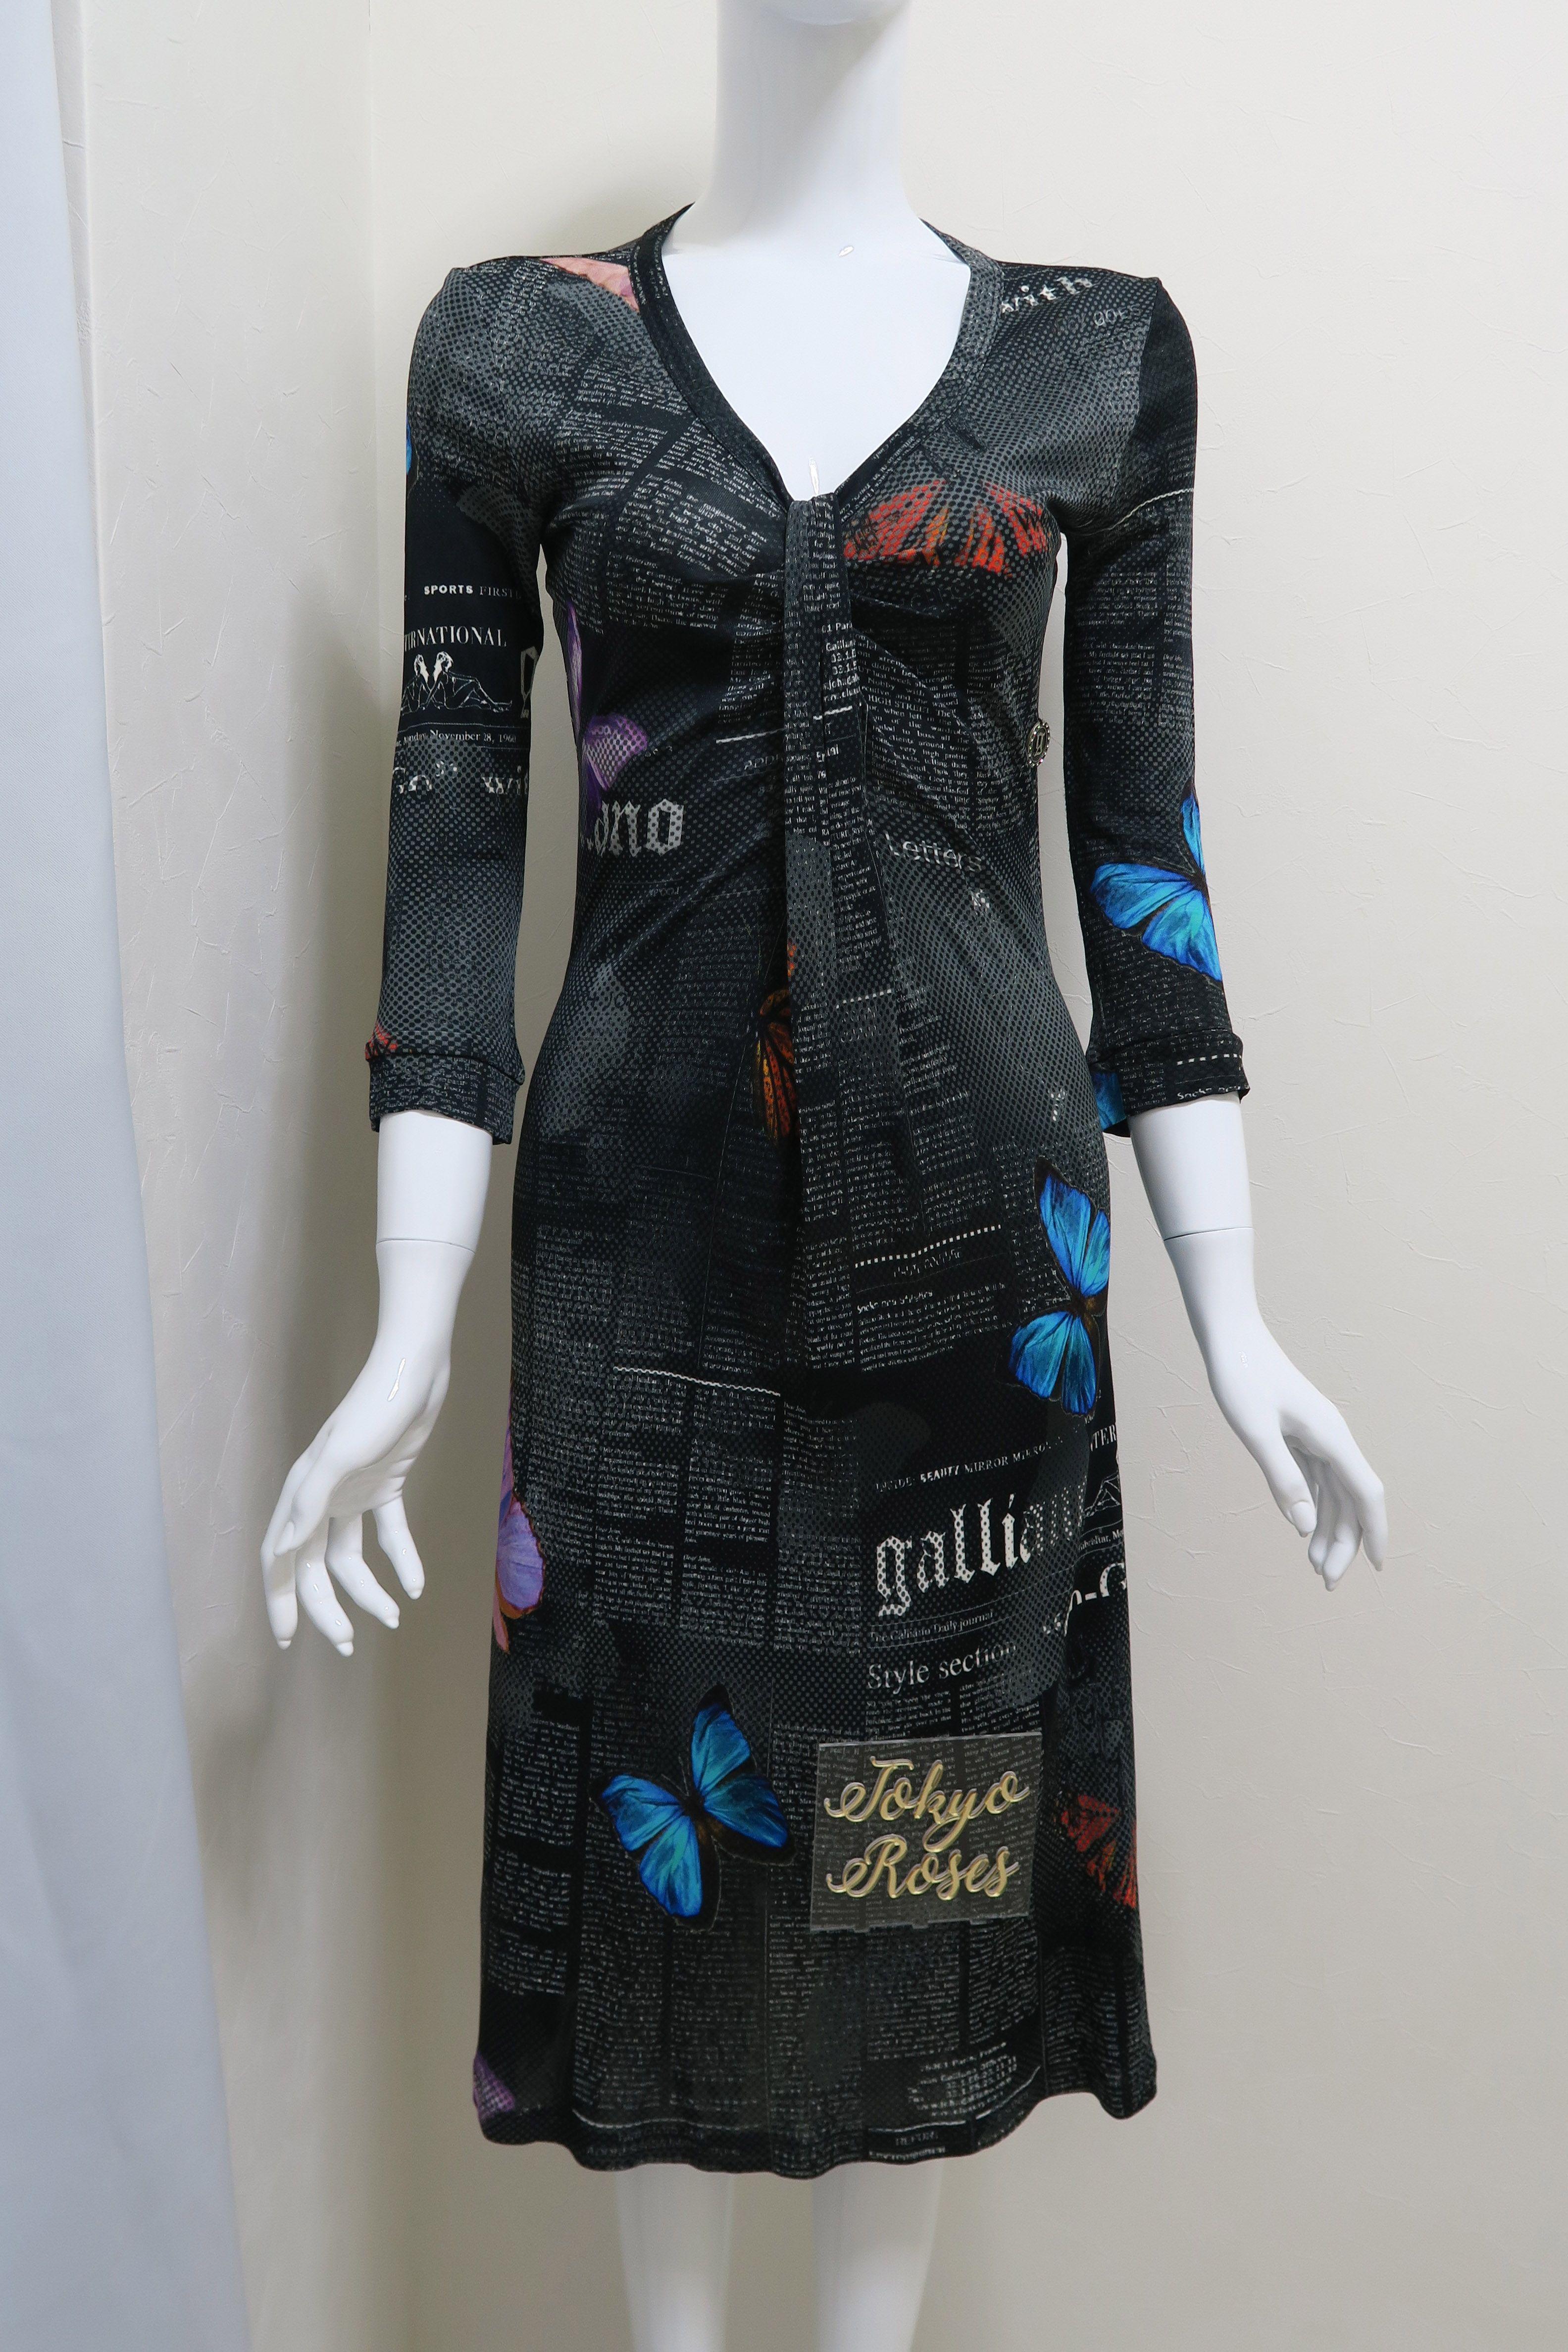 John Galliano Gazette Newspaper Print Long Sleeve Dress Black Butterfly Tokyo Roses Vintage Long Sleeve Print Dress Black Long Sleeve Dress Long Sleeve Dress